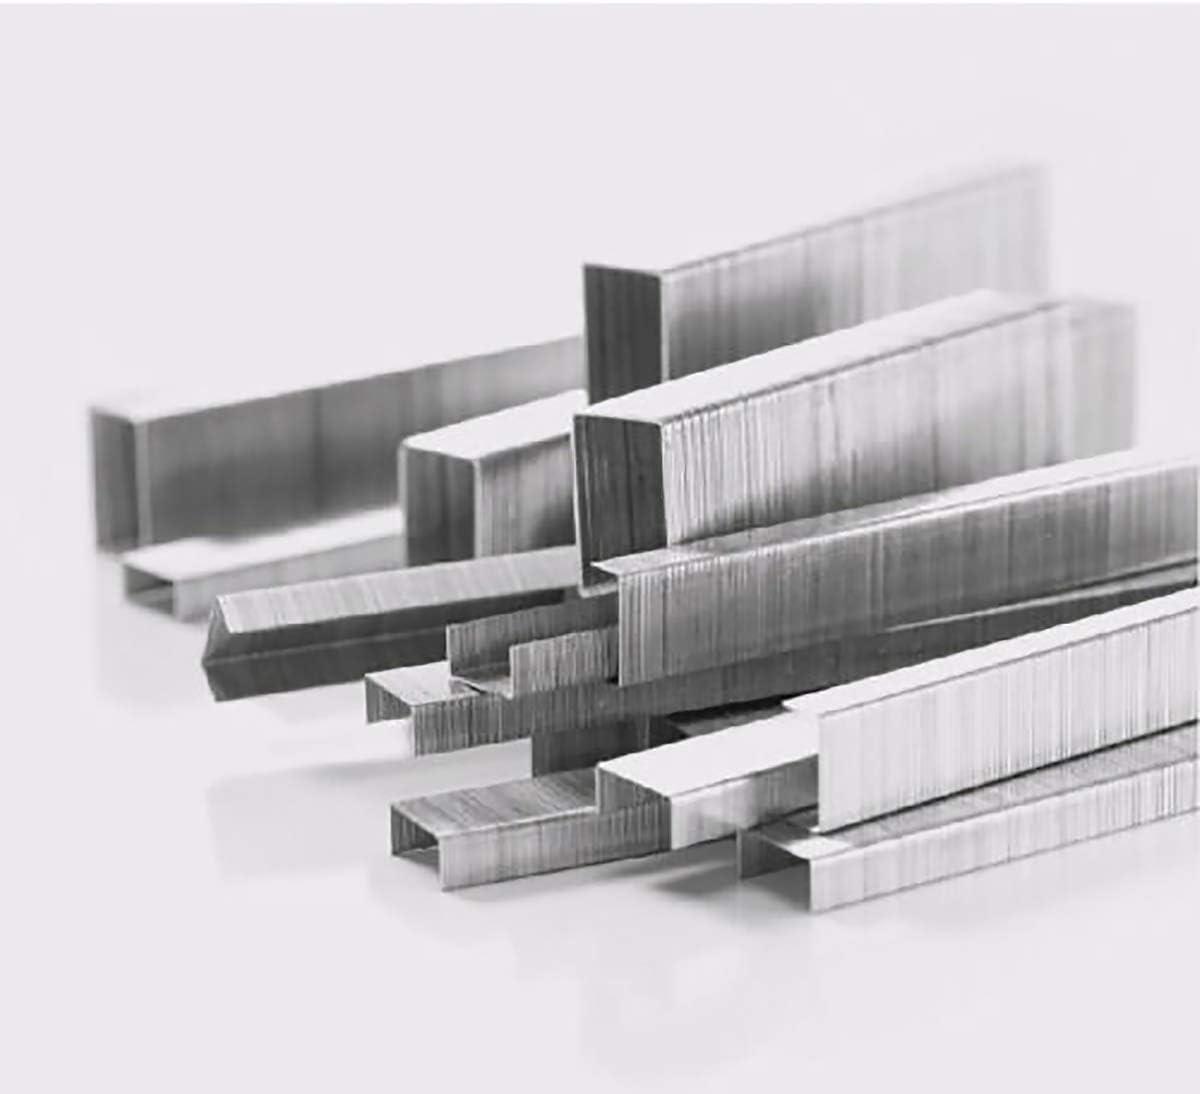 Staples Grapas free shipping en forma de puerta estándar Clavos 10 Safety and trust metal 23